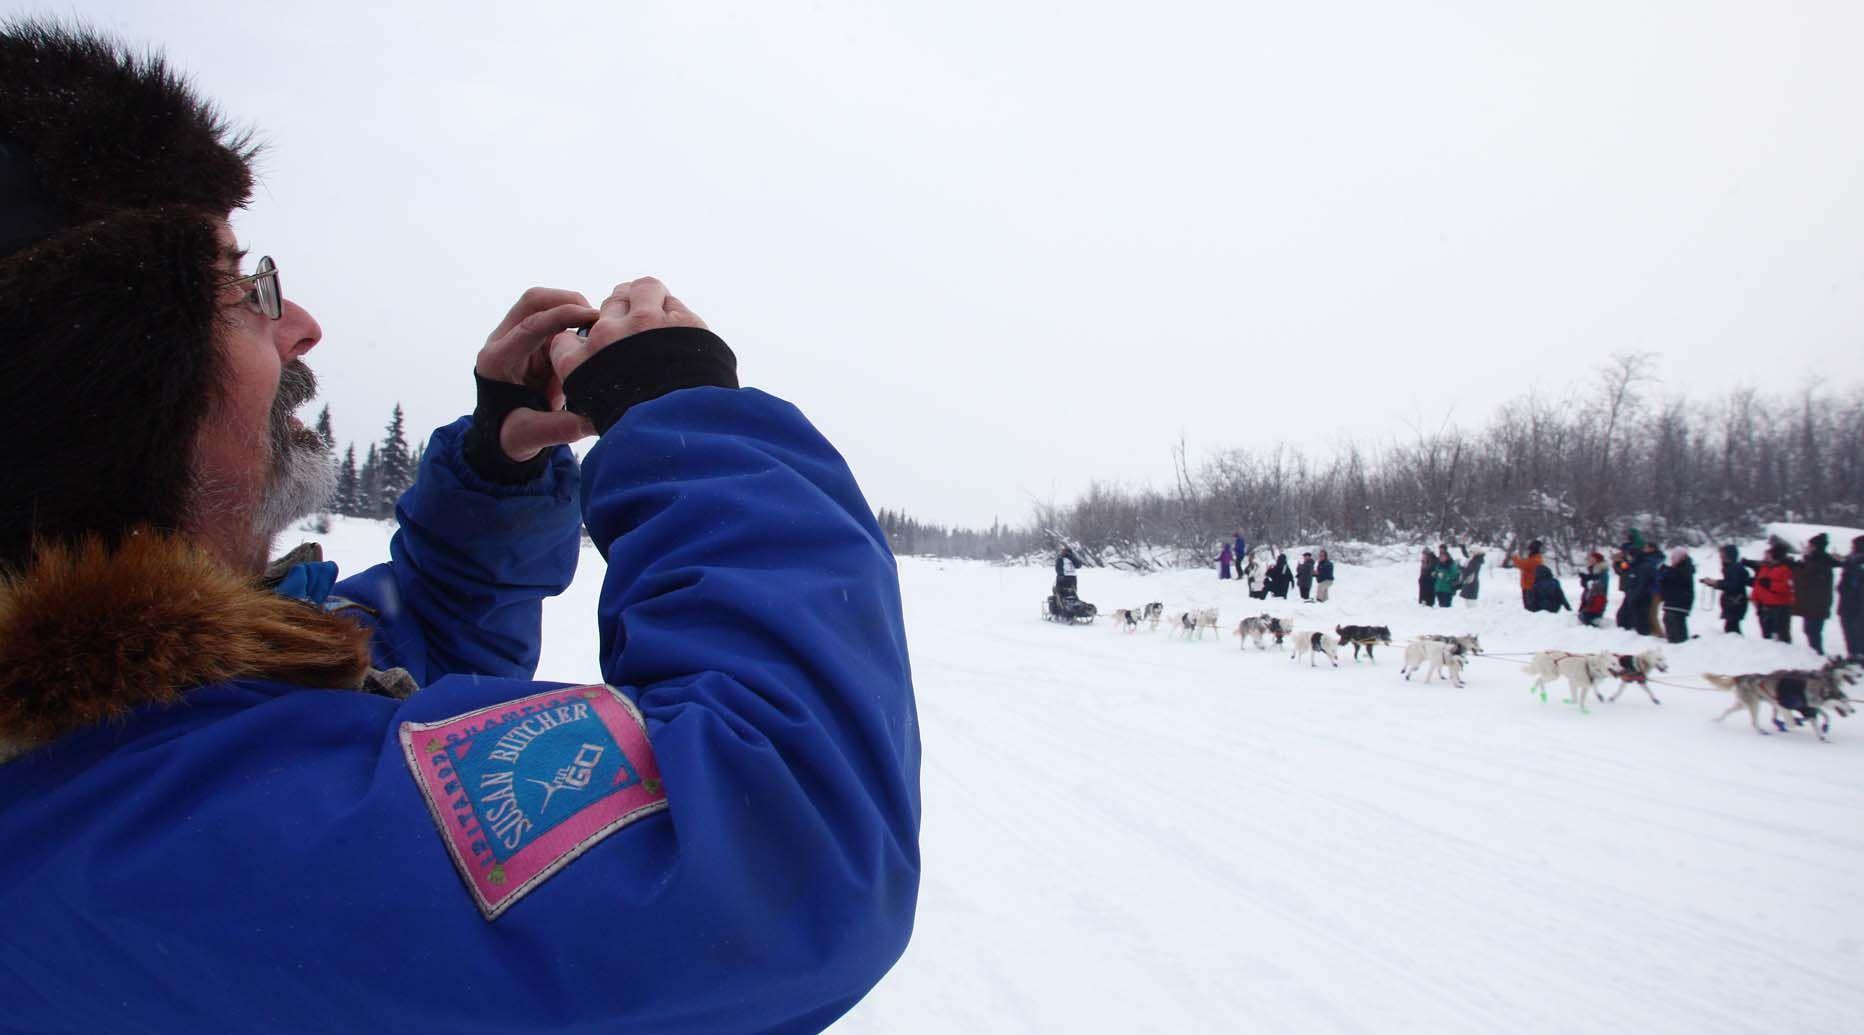 Communication on this topic: Maria Grazia Buccella (born 1940), susan-butcher-sled-dog-musher/